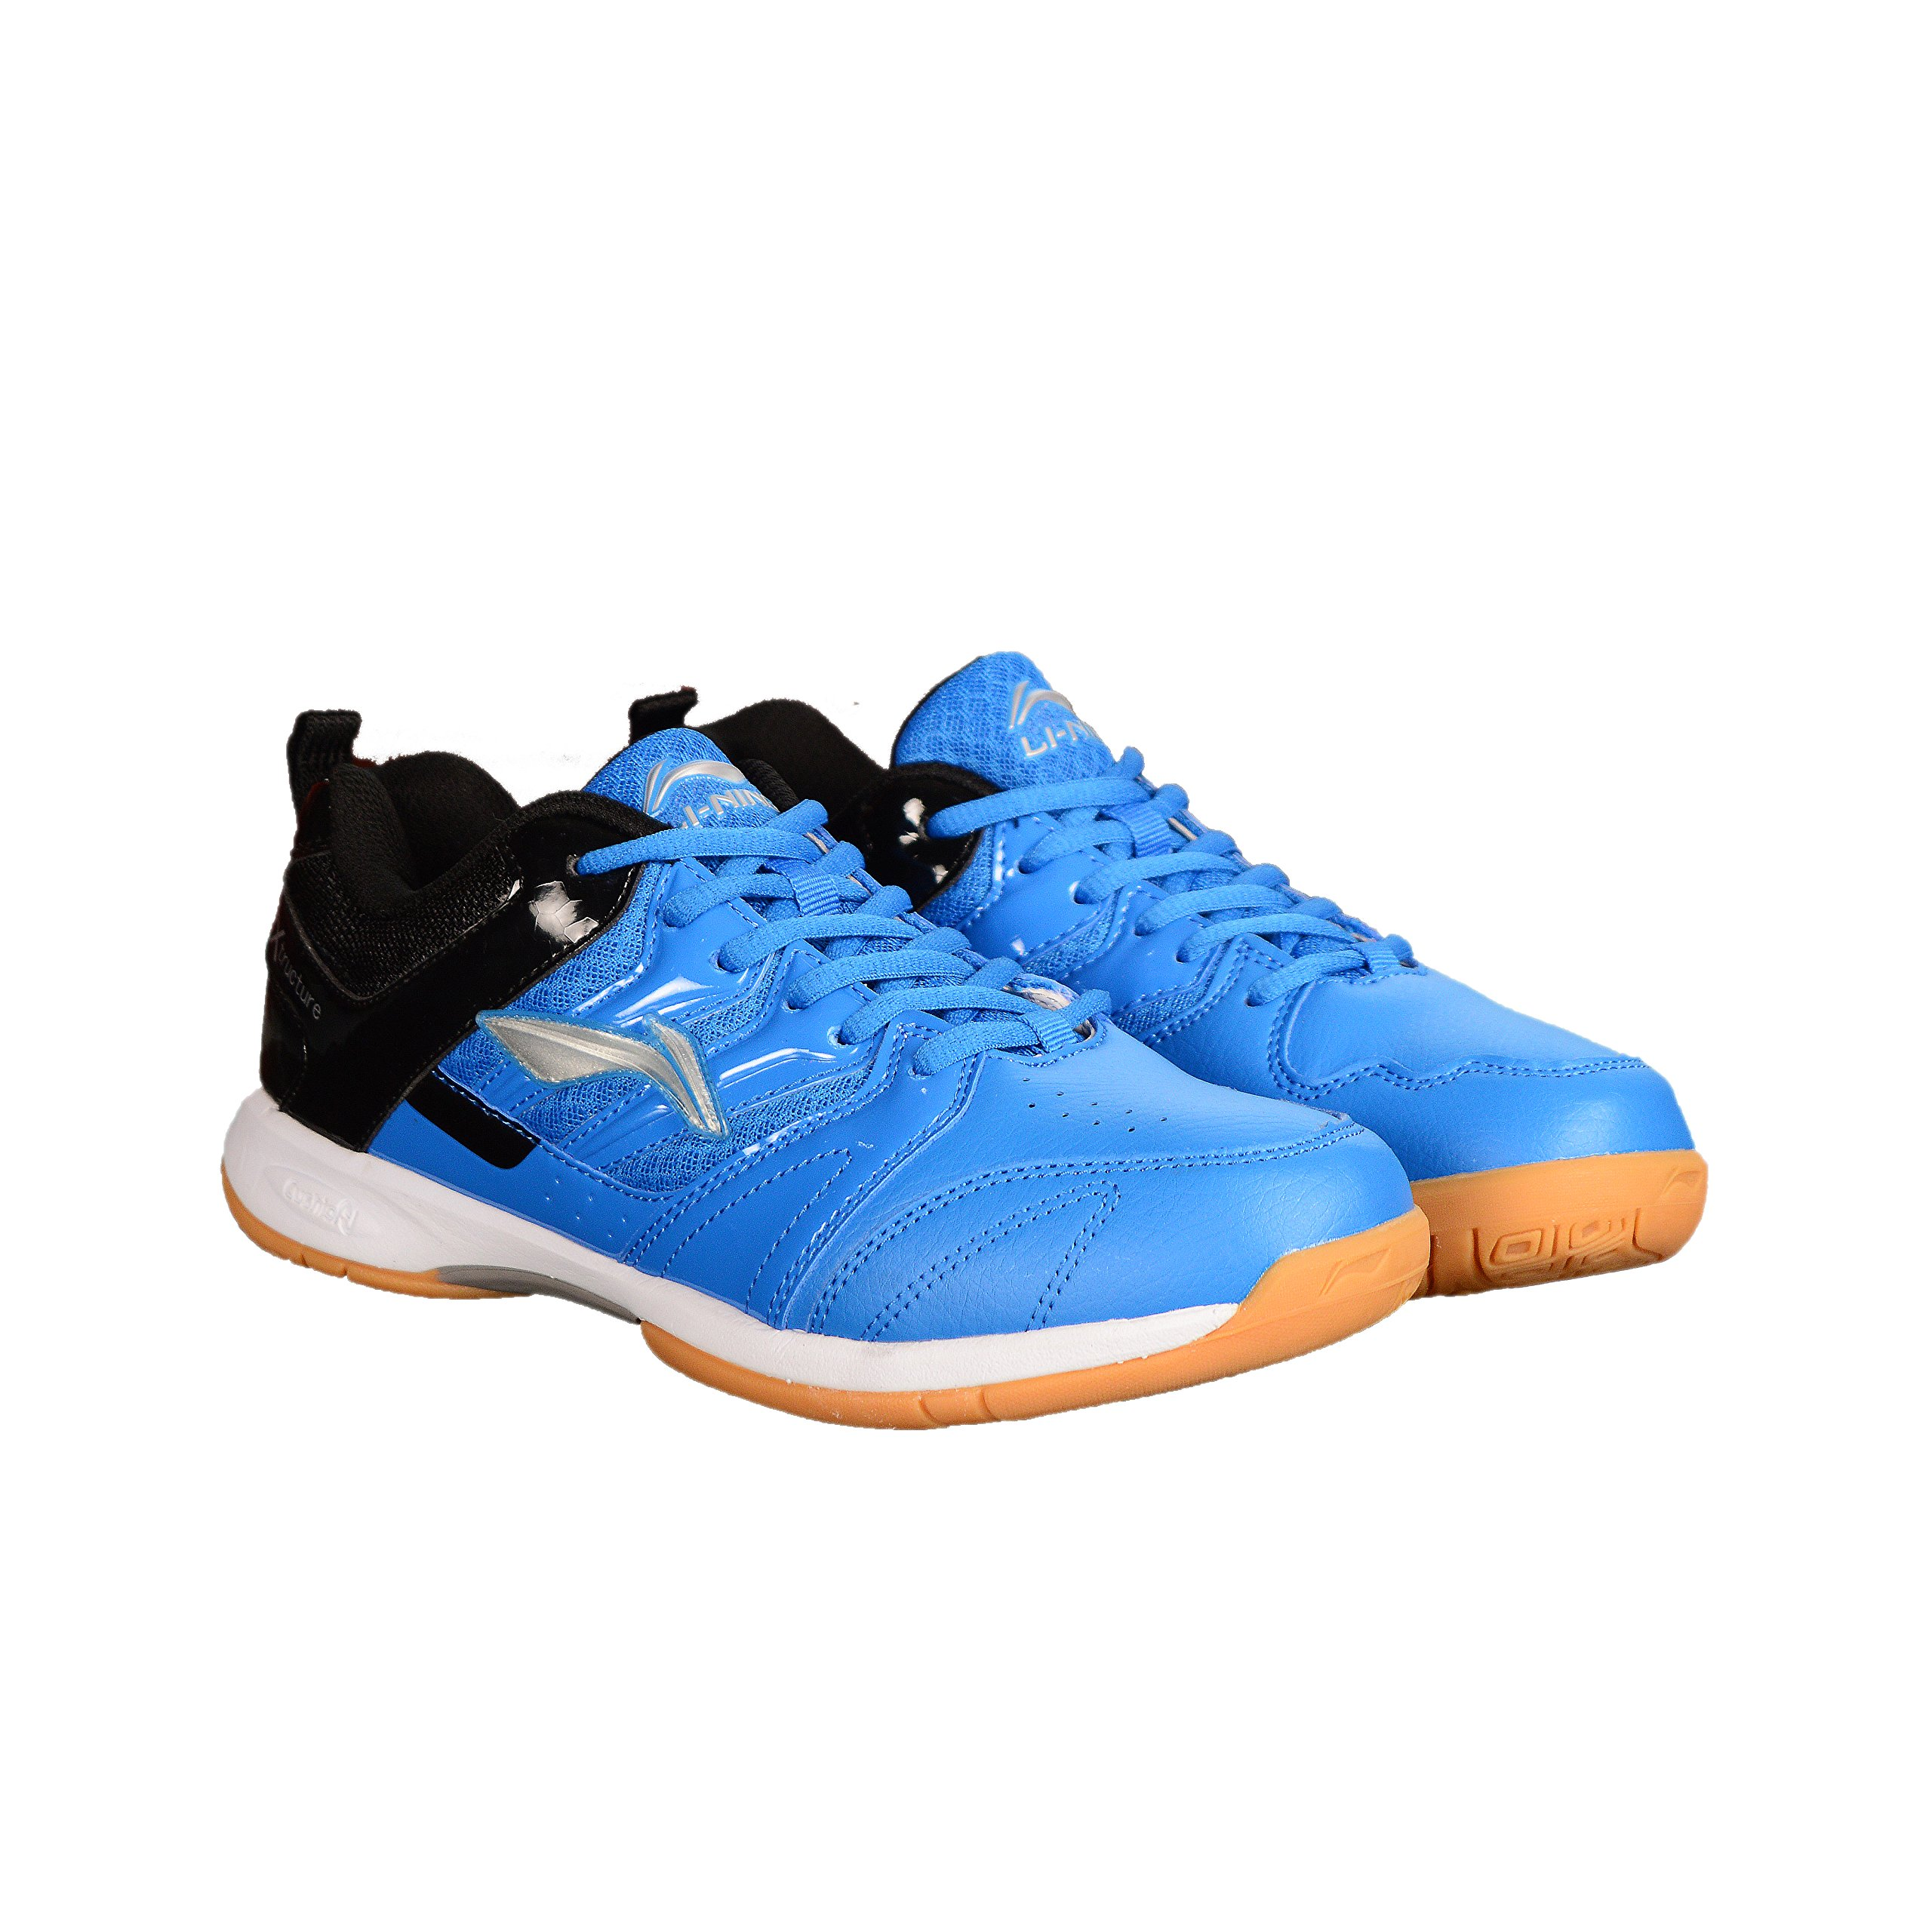 Li-Ning Smash Badminton Shoe product image